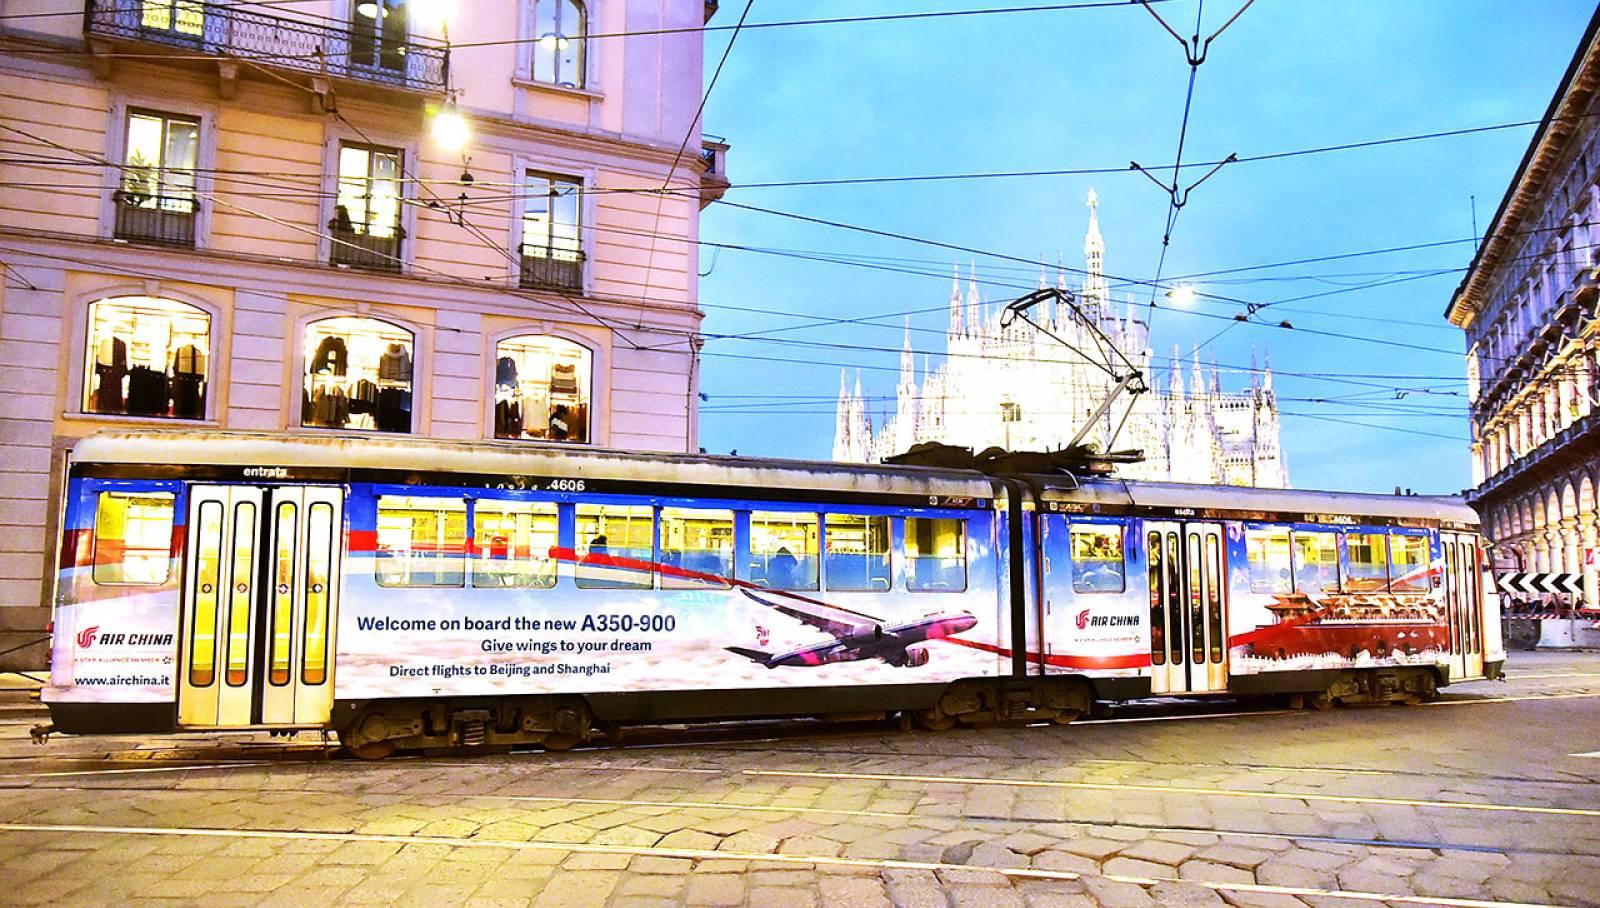 Pubblicità sui tram a Milano tram decorato IGPDecaux per Air China